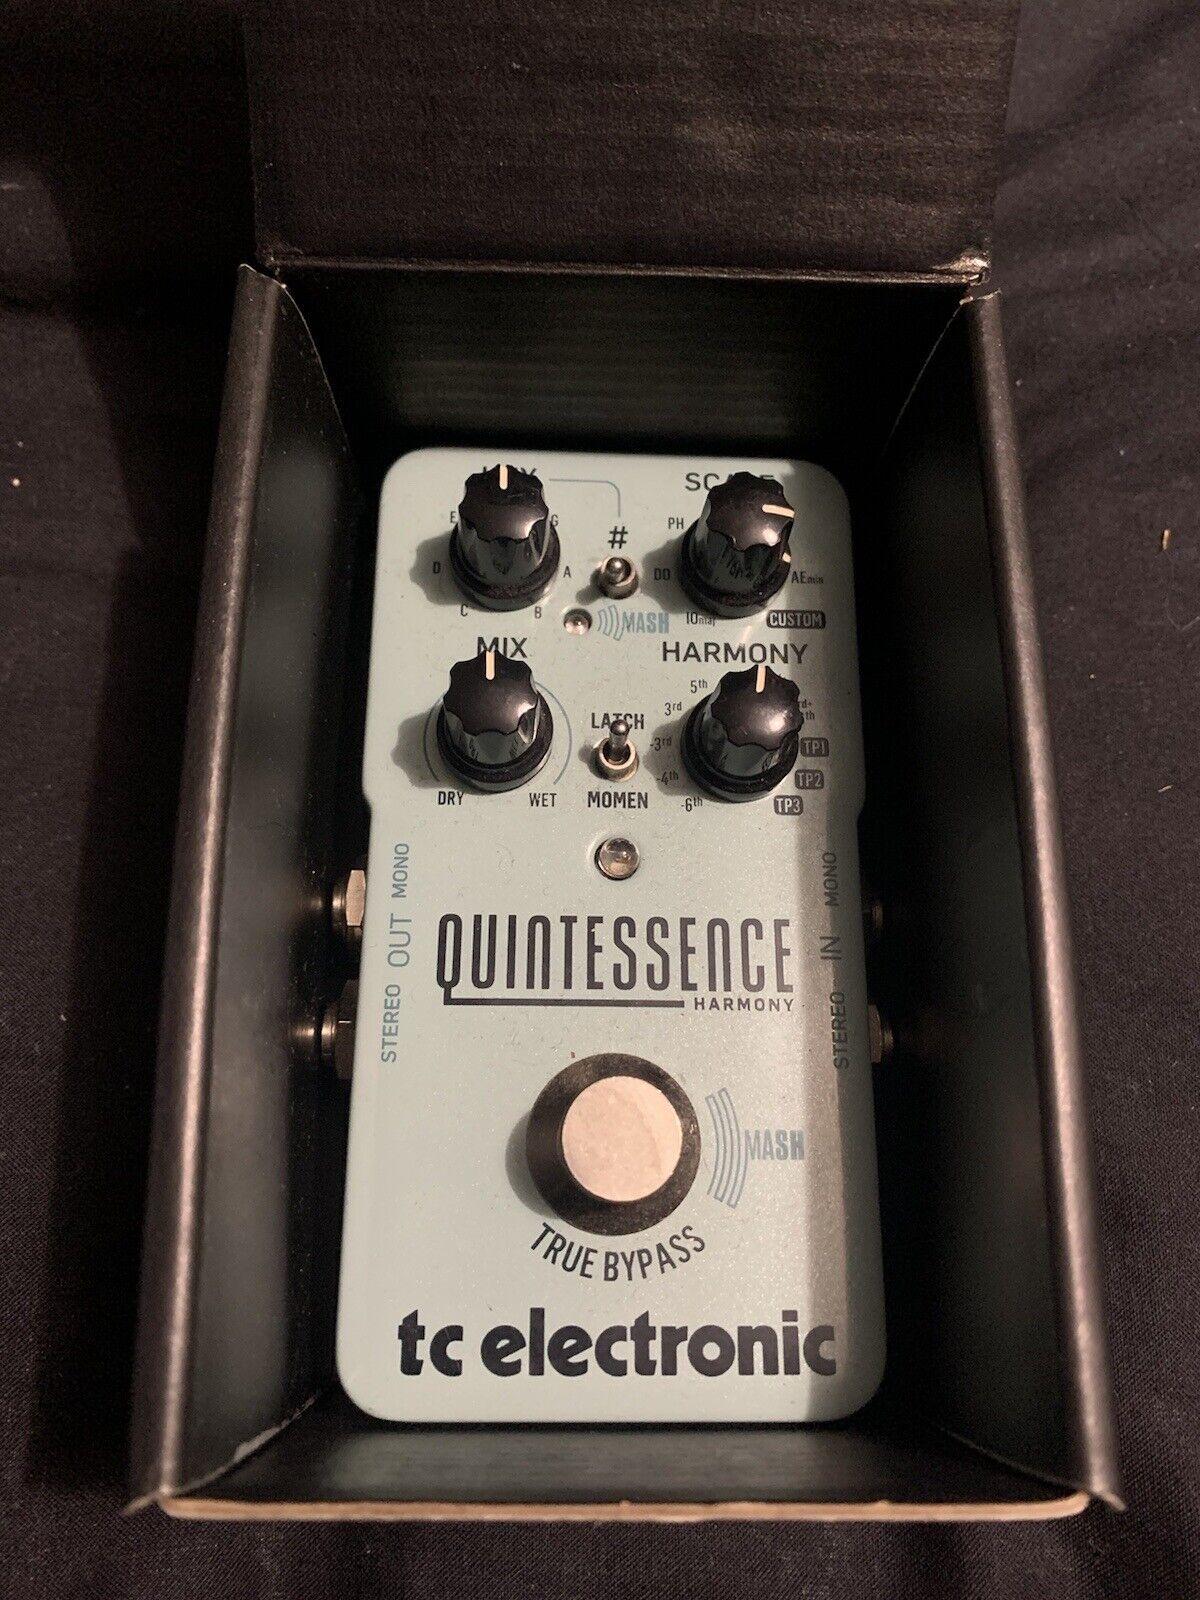 TC Electronic Quintessence Harmony Guitar Pedal